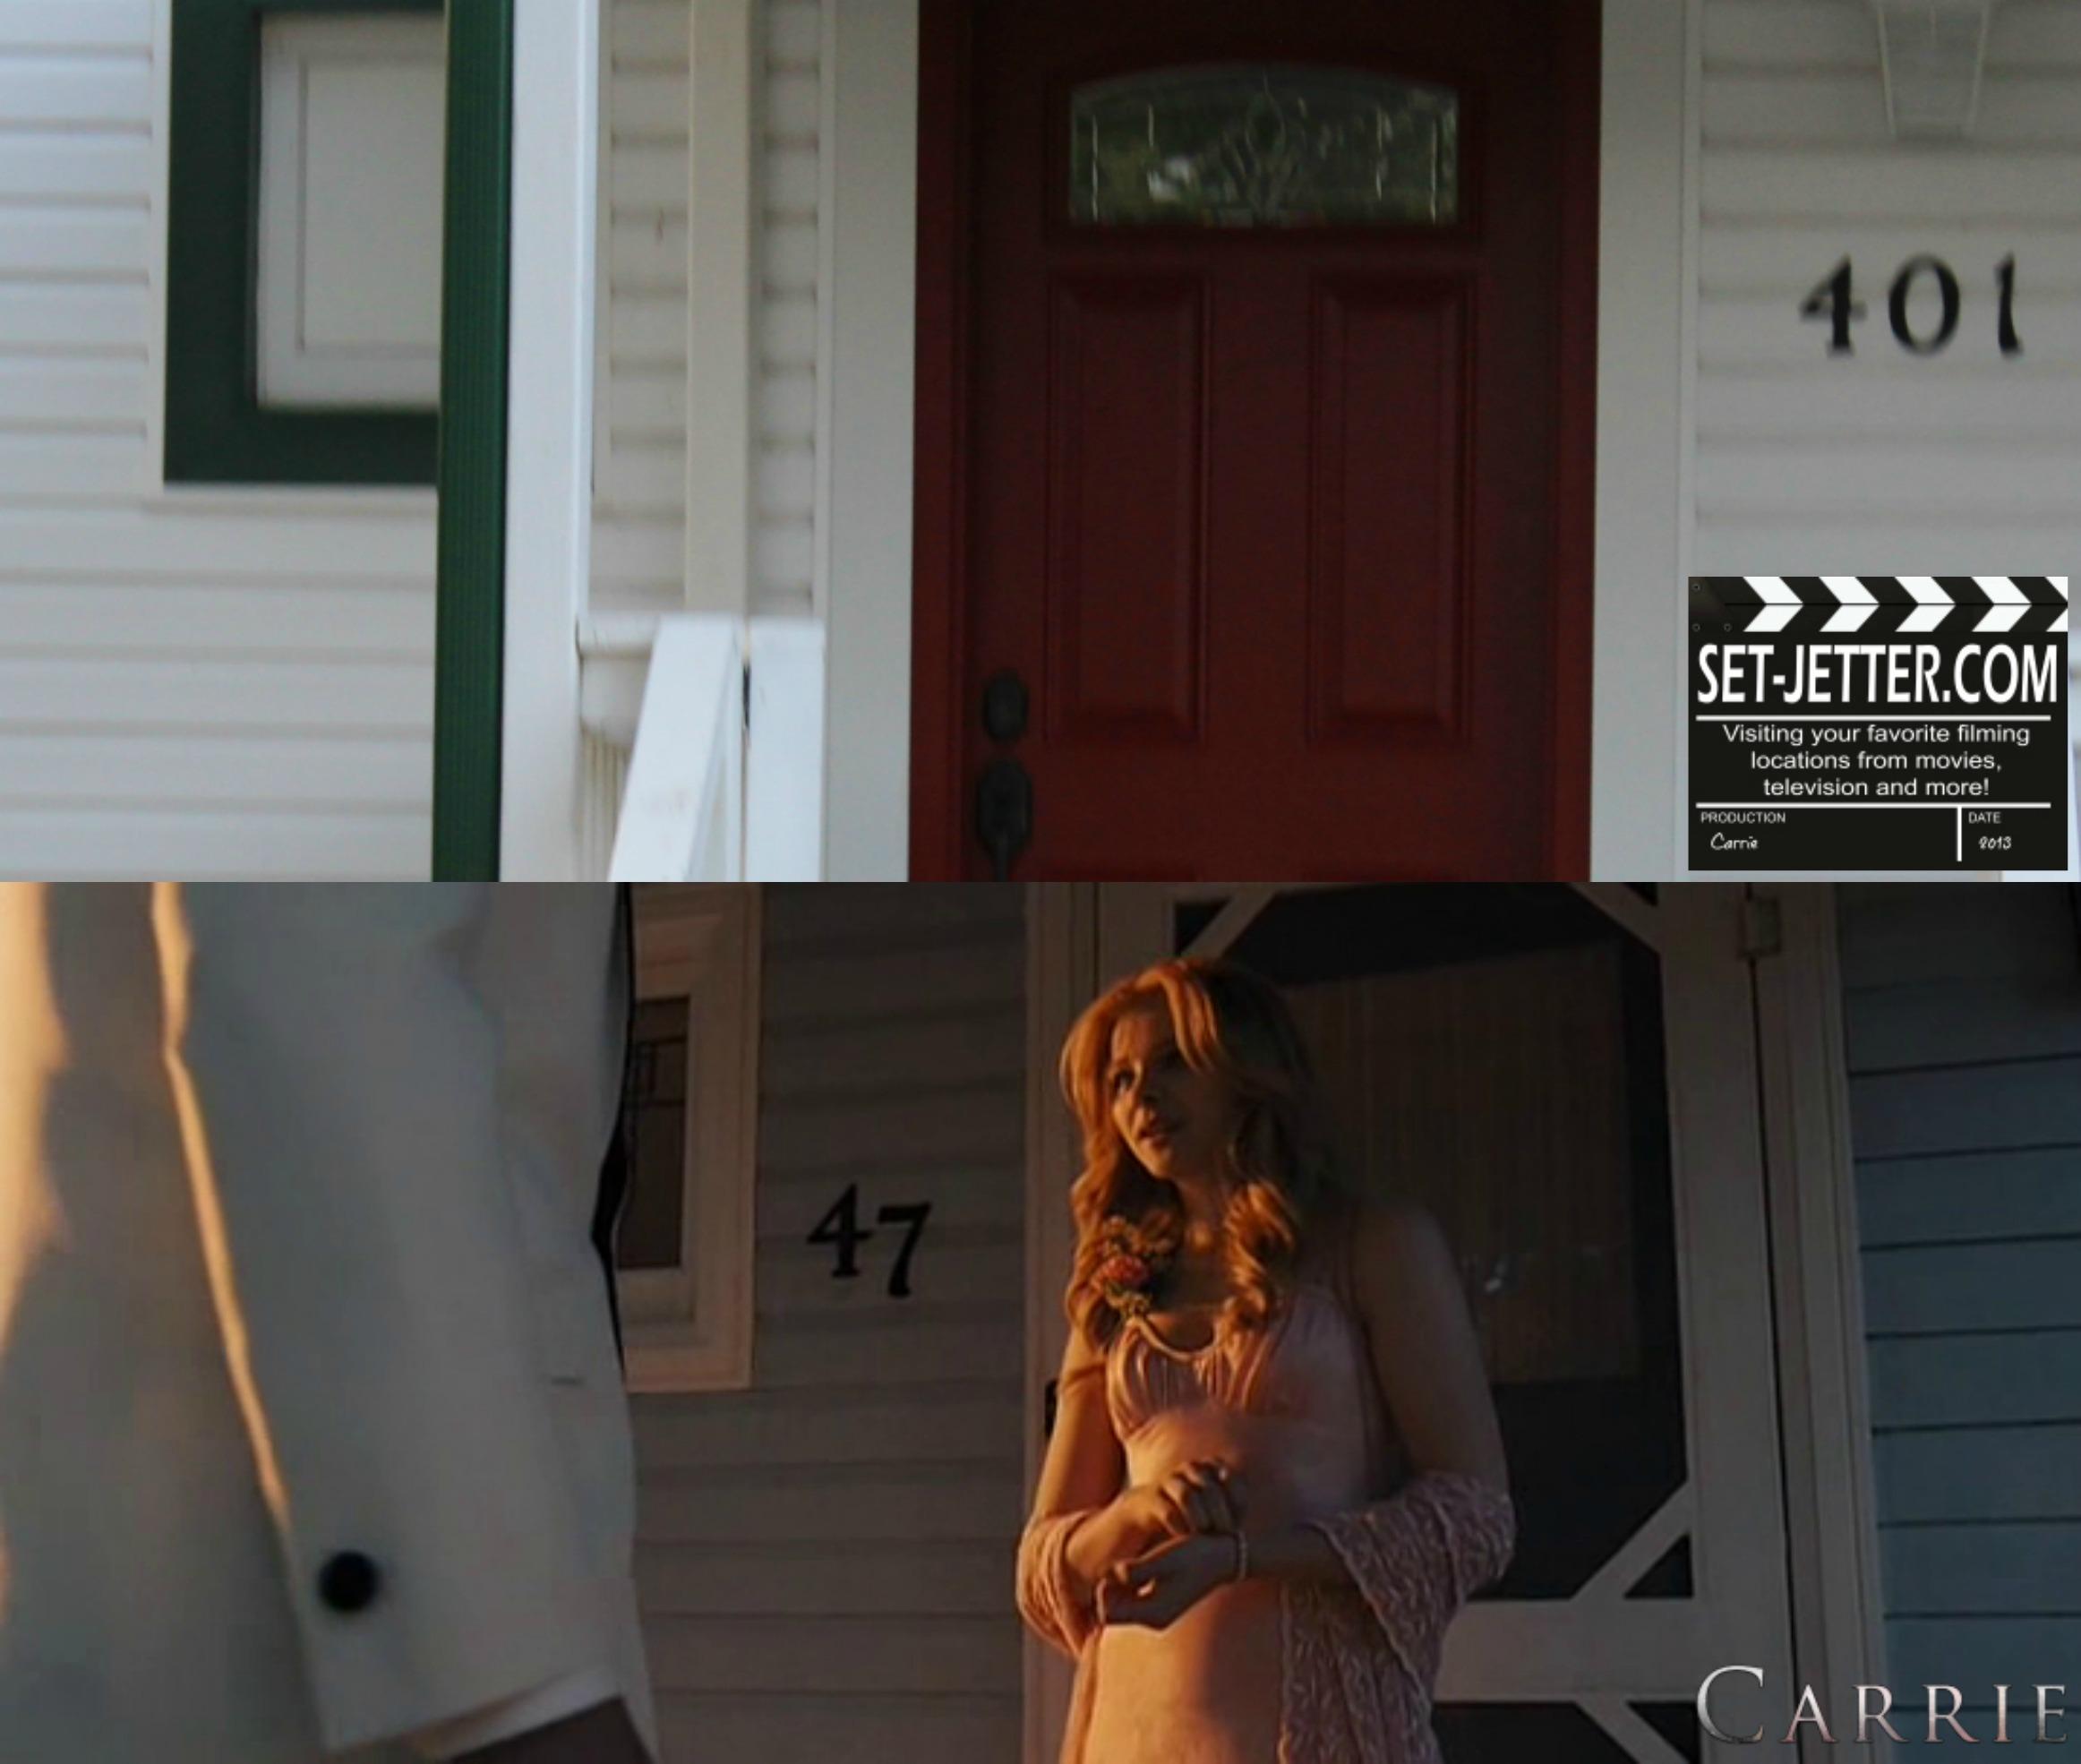 Carrie 2013 comparison 51.jpg